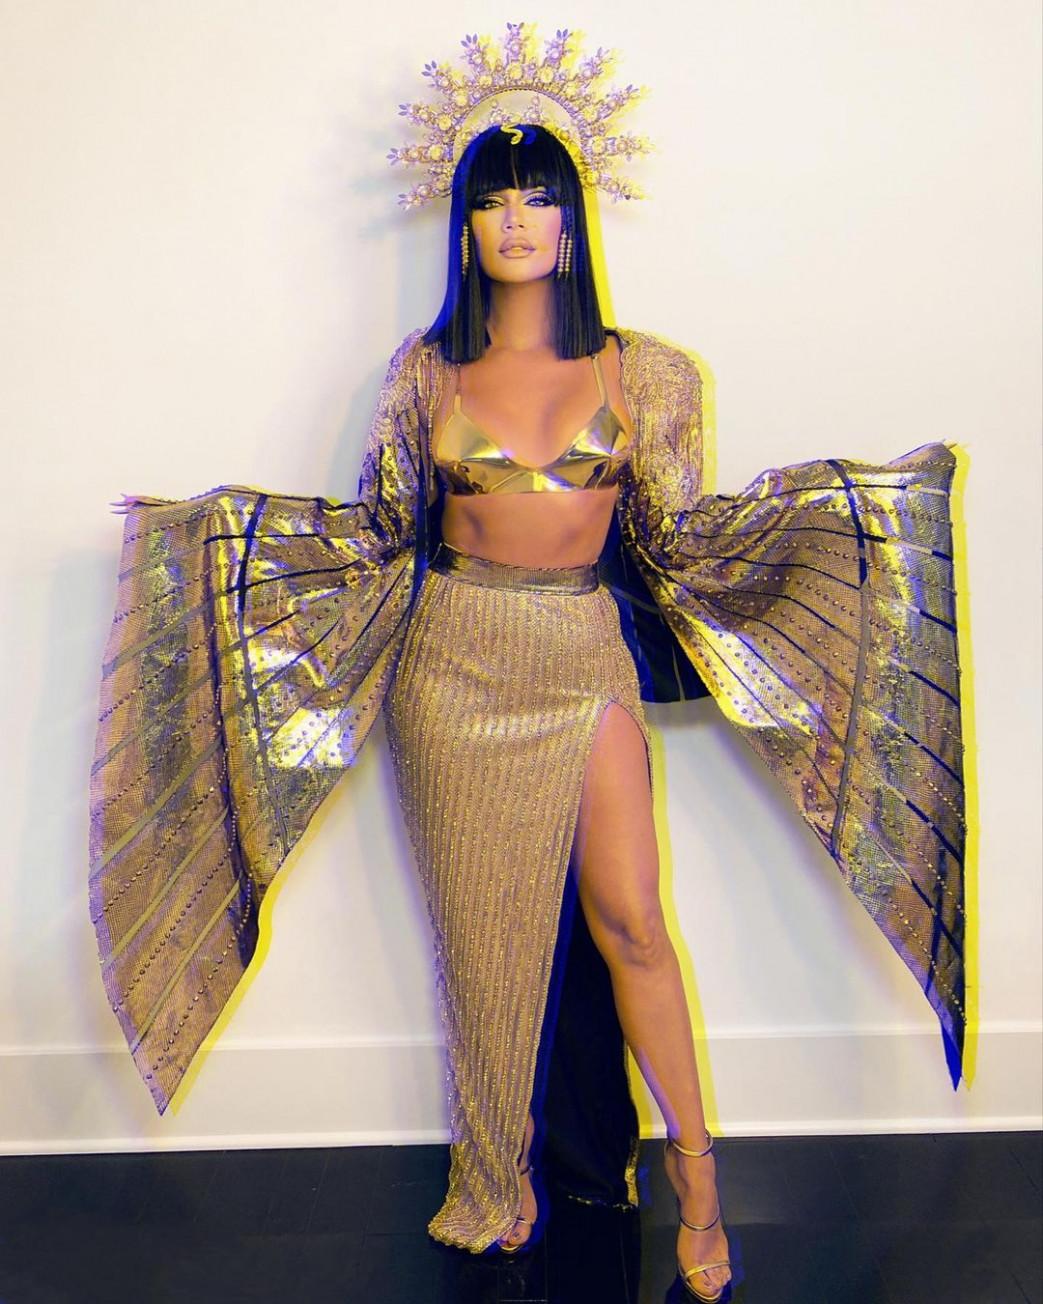 Khloe Kardashian Hot In Cleopatra Halloween Costume